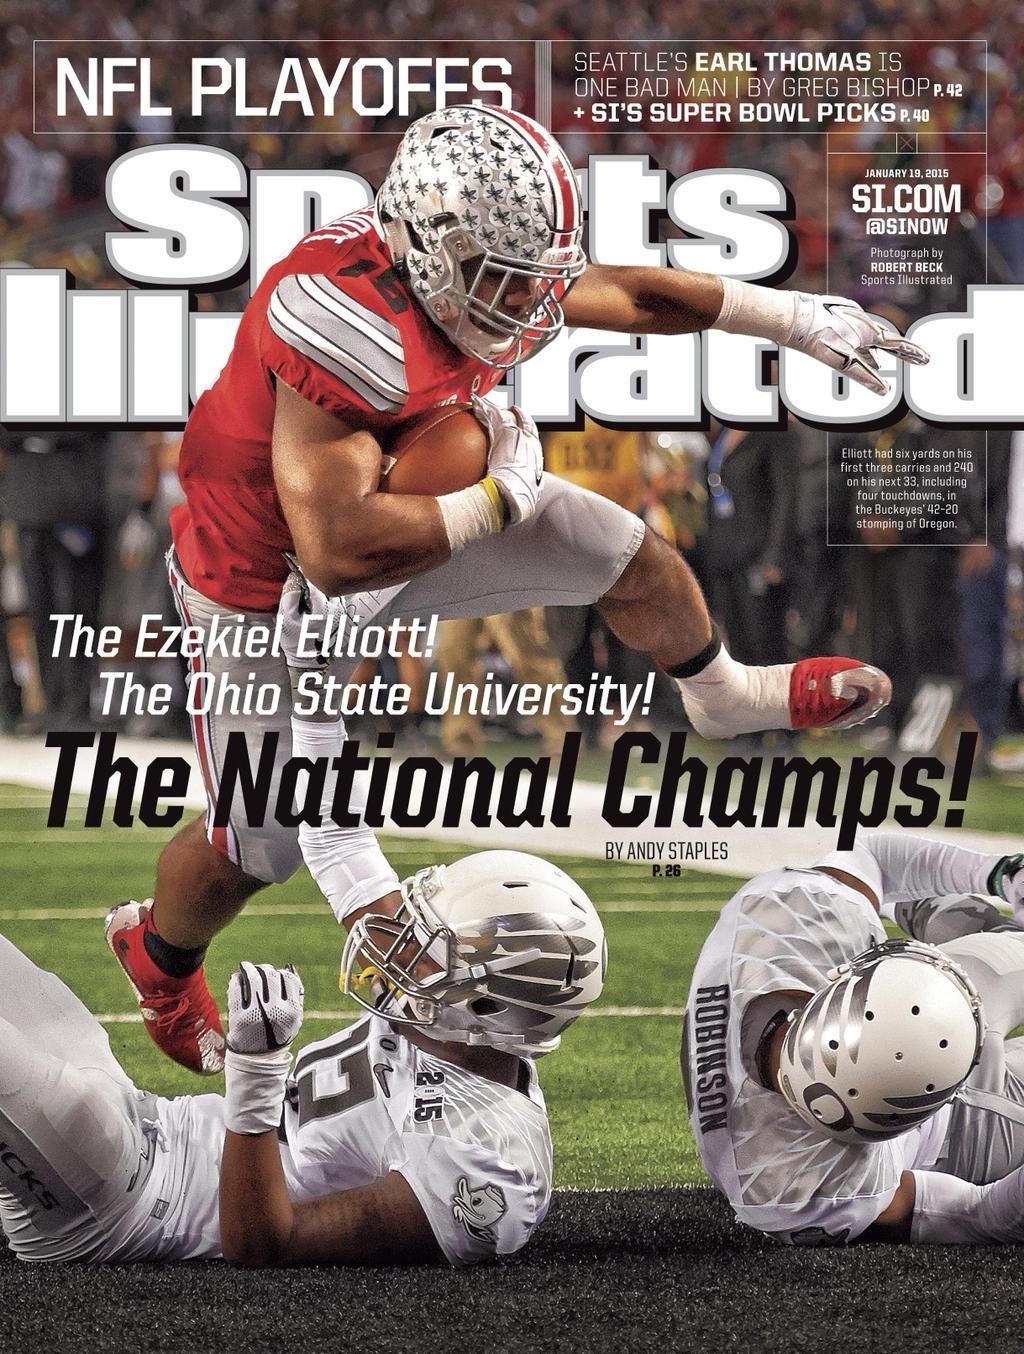 Ezekiel elliott ohio state beat oregon to win national - Ezekiel Elliott On Si After Winning The National Championship 2015 Ohio State